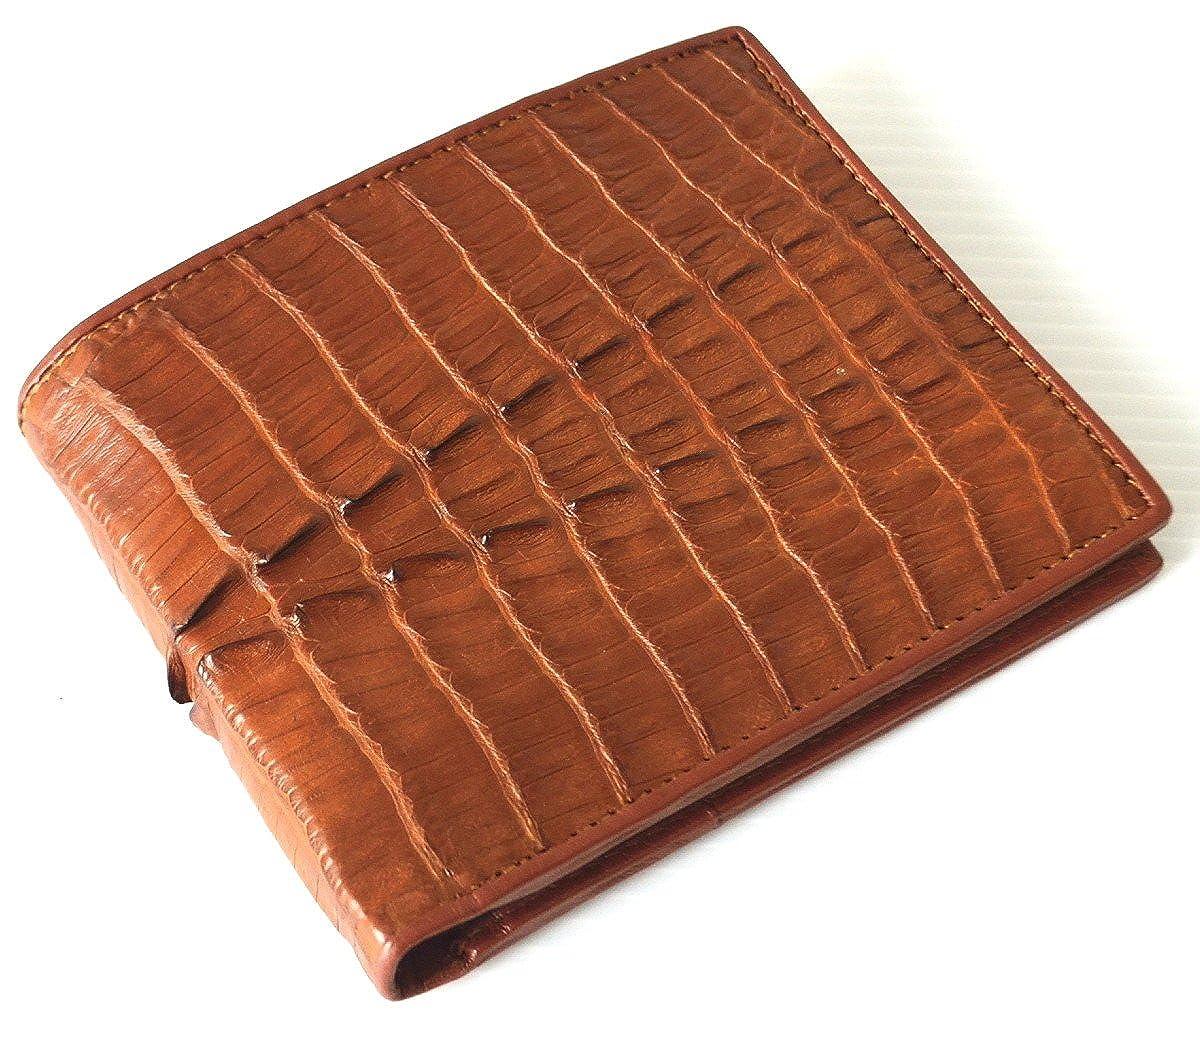 Authentic M Crocodile Skin Mens Bifold Crocodile Tail Skin Leather Wallet